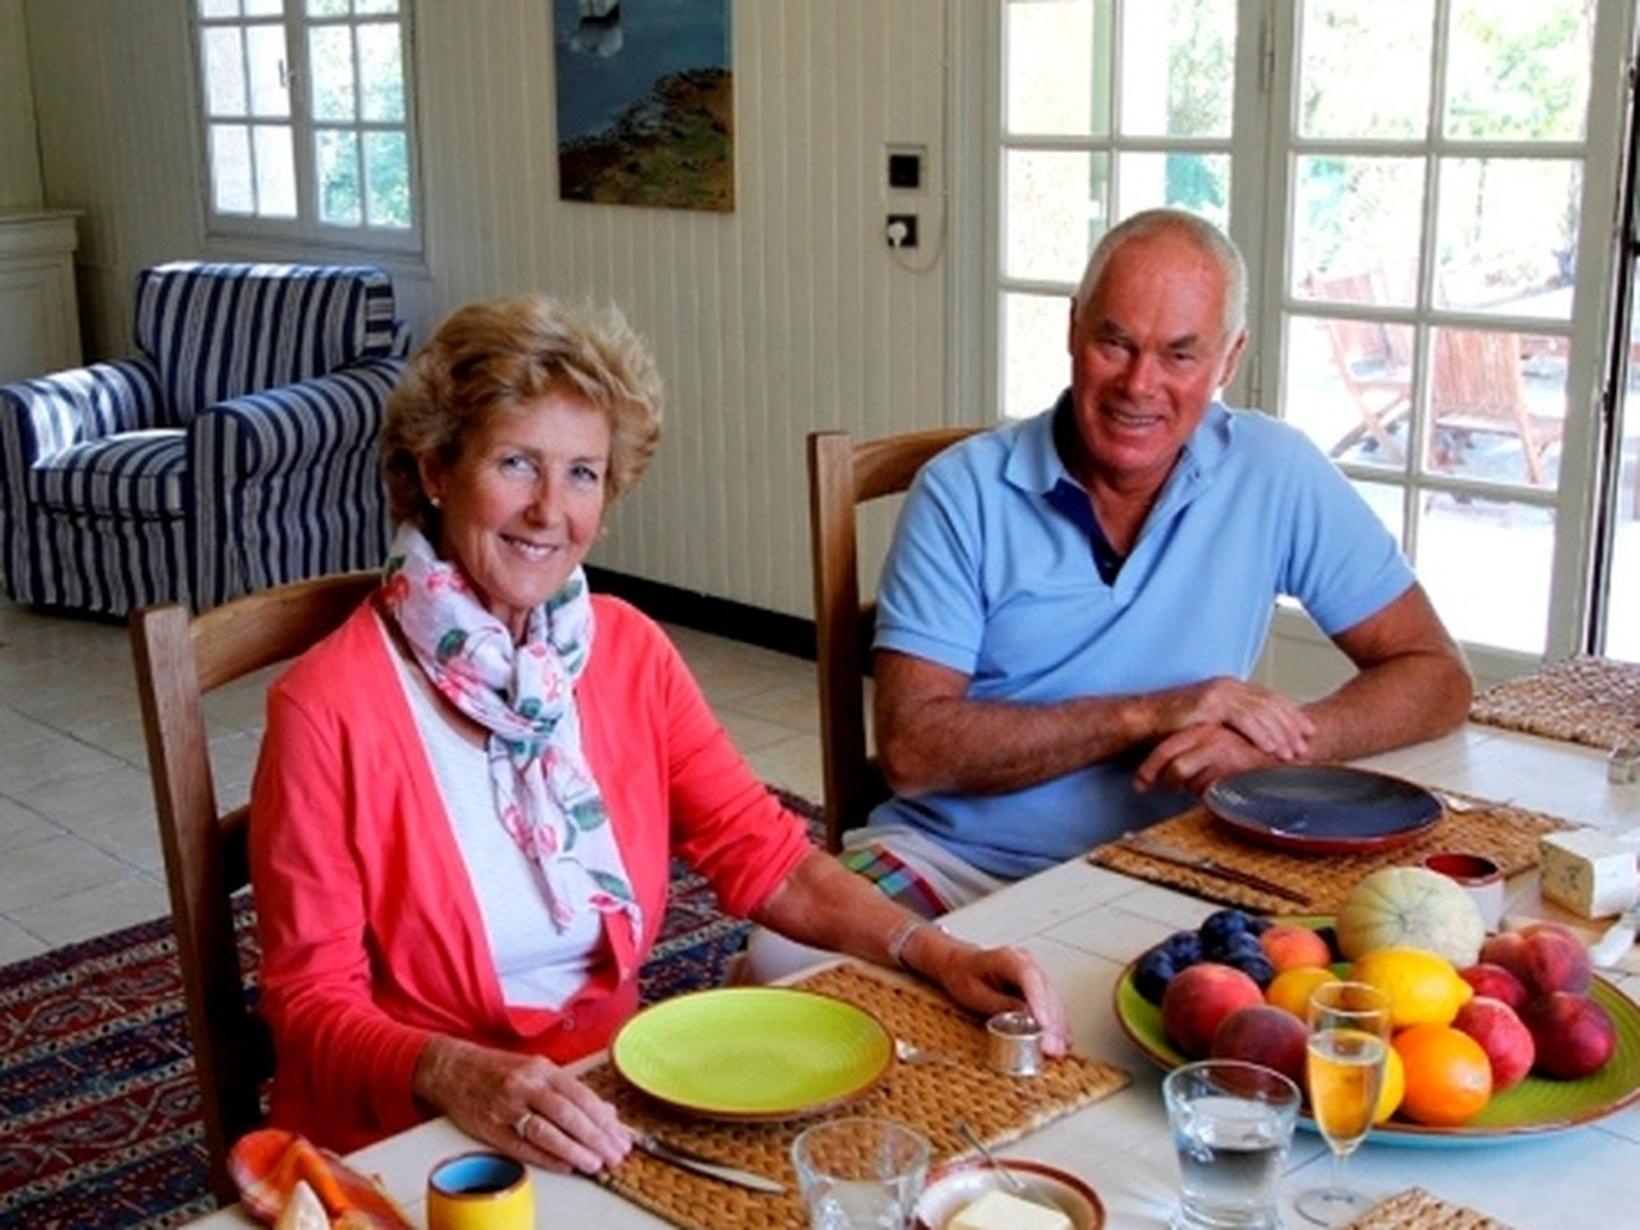 Tony and judith & Judith from Uzès, France